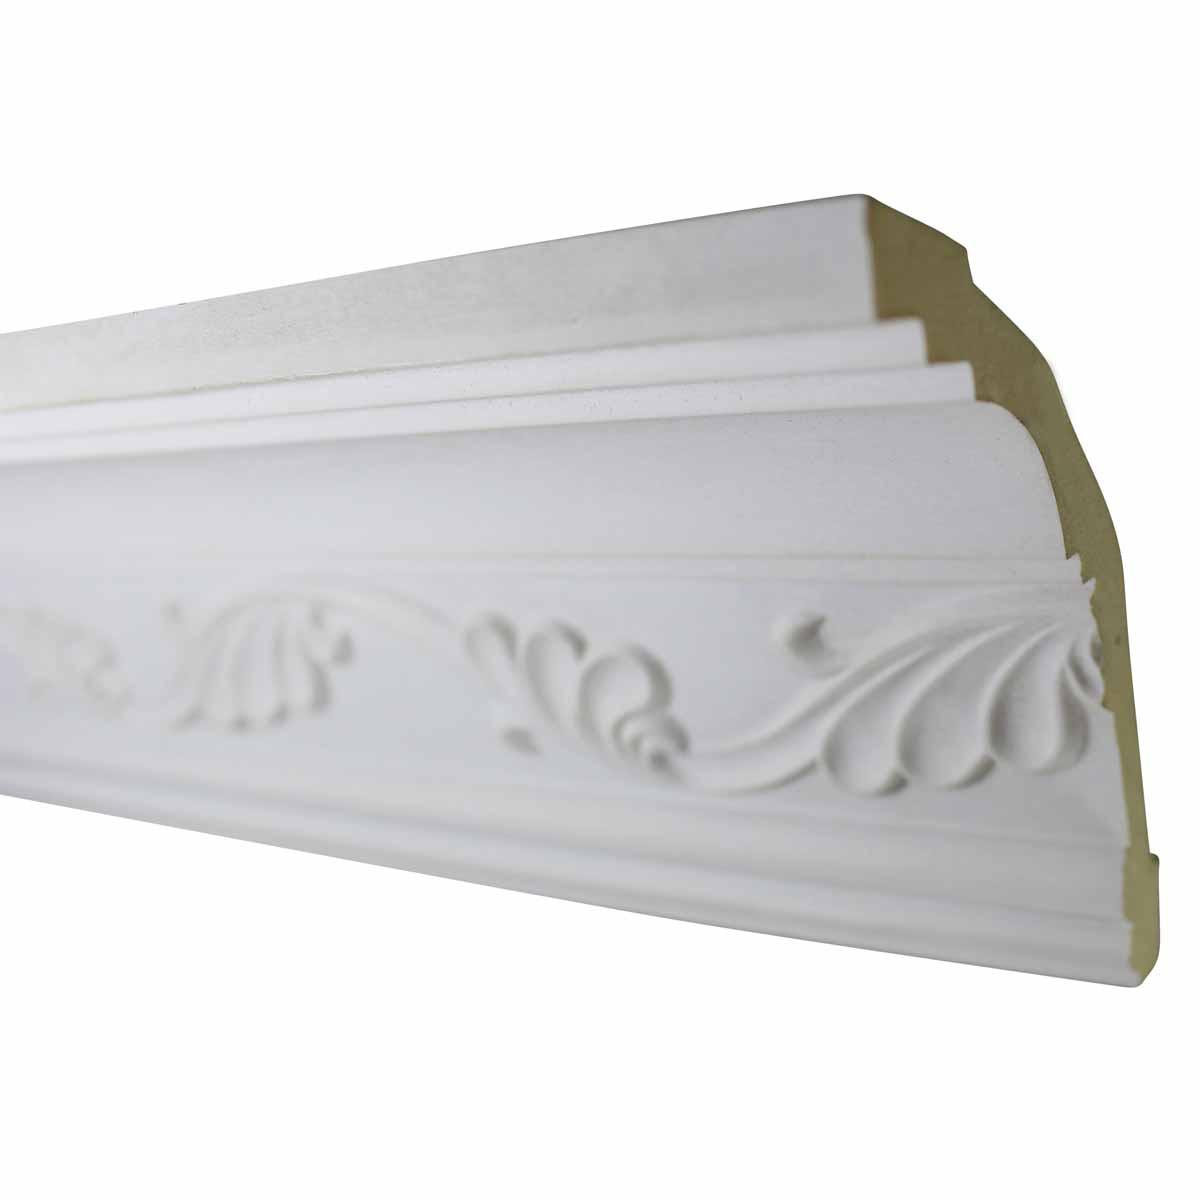 Cornice White Urethane Sample of 12420 24 Cornice Cornice Moulding Cornice Molding